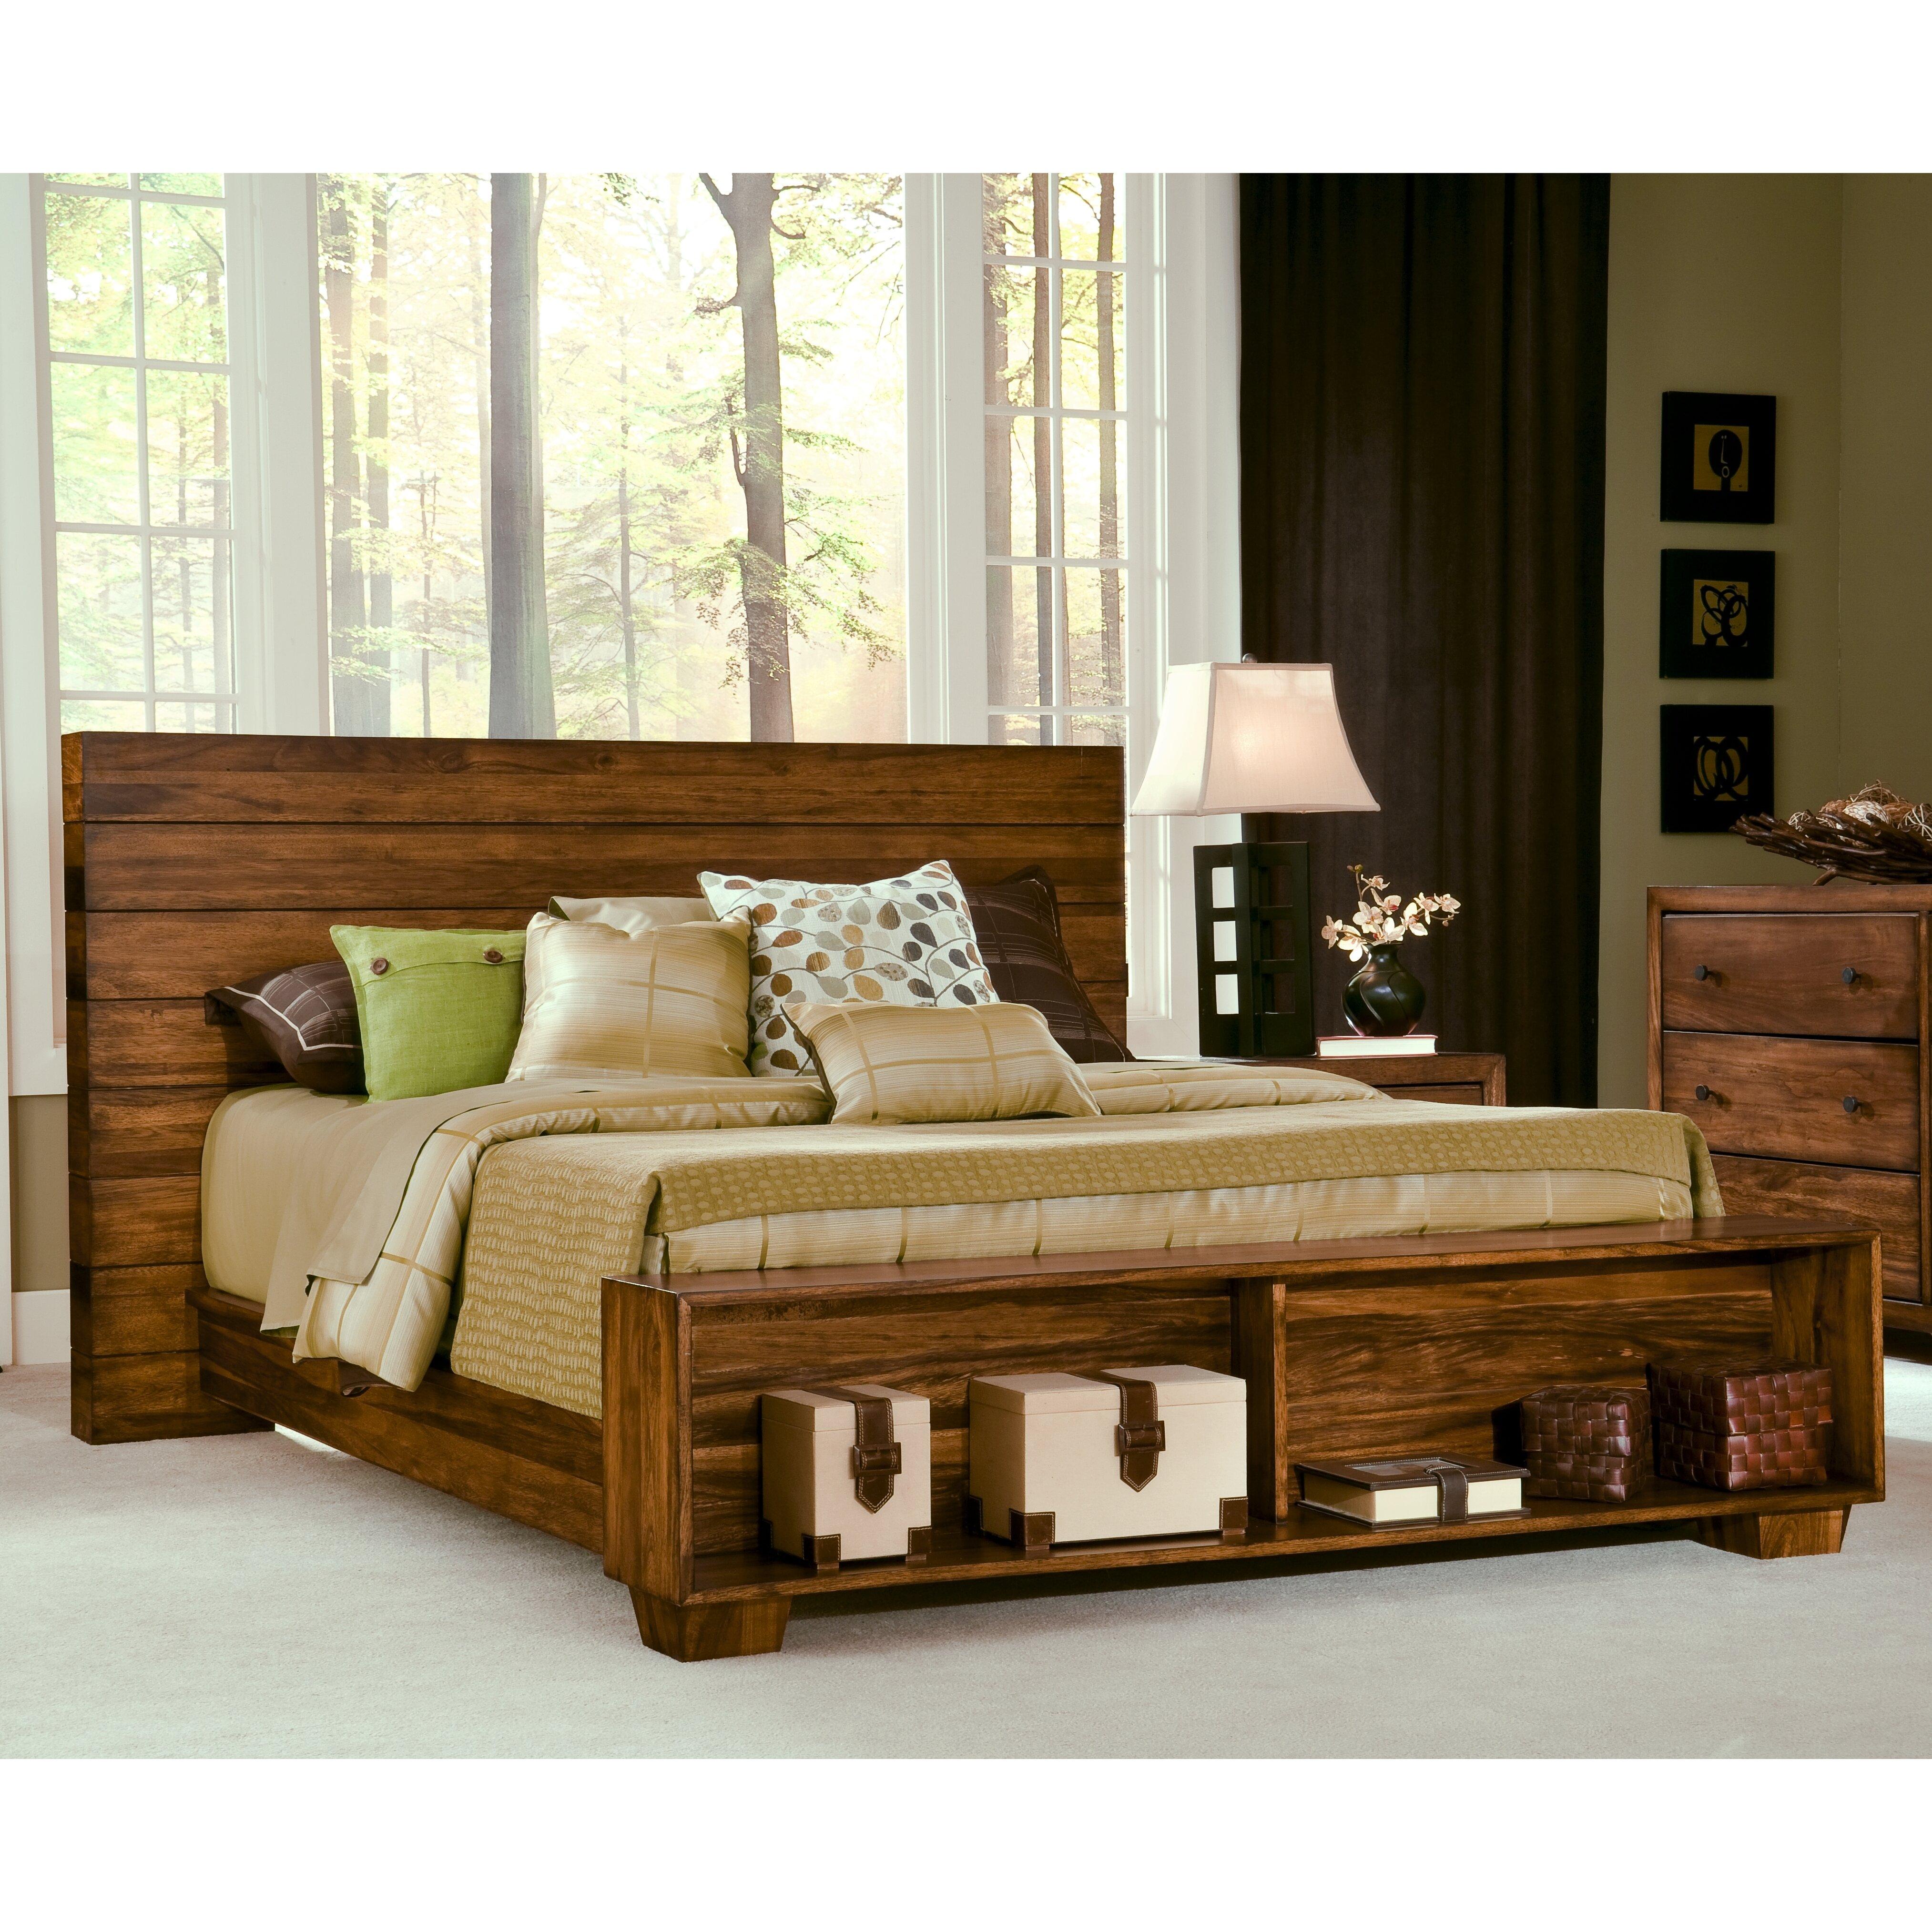 angelo HOME Chelsea Panel Platform Customizable Bedroom Set. angelo HOME Chelsea Panel Platform Customizable Bedroom Set